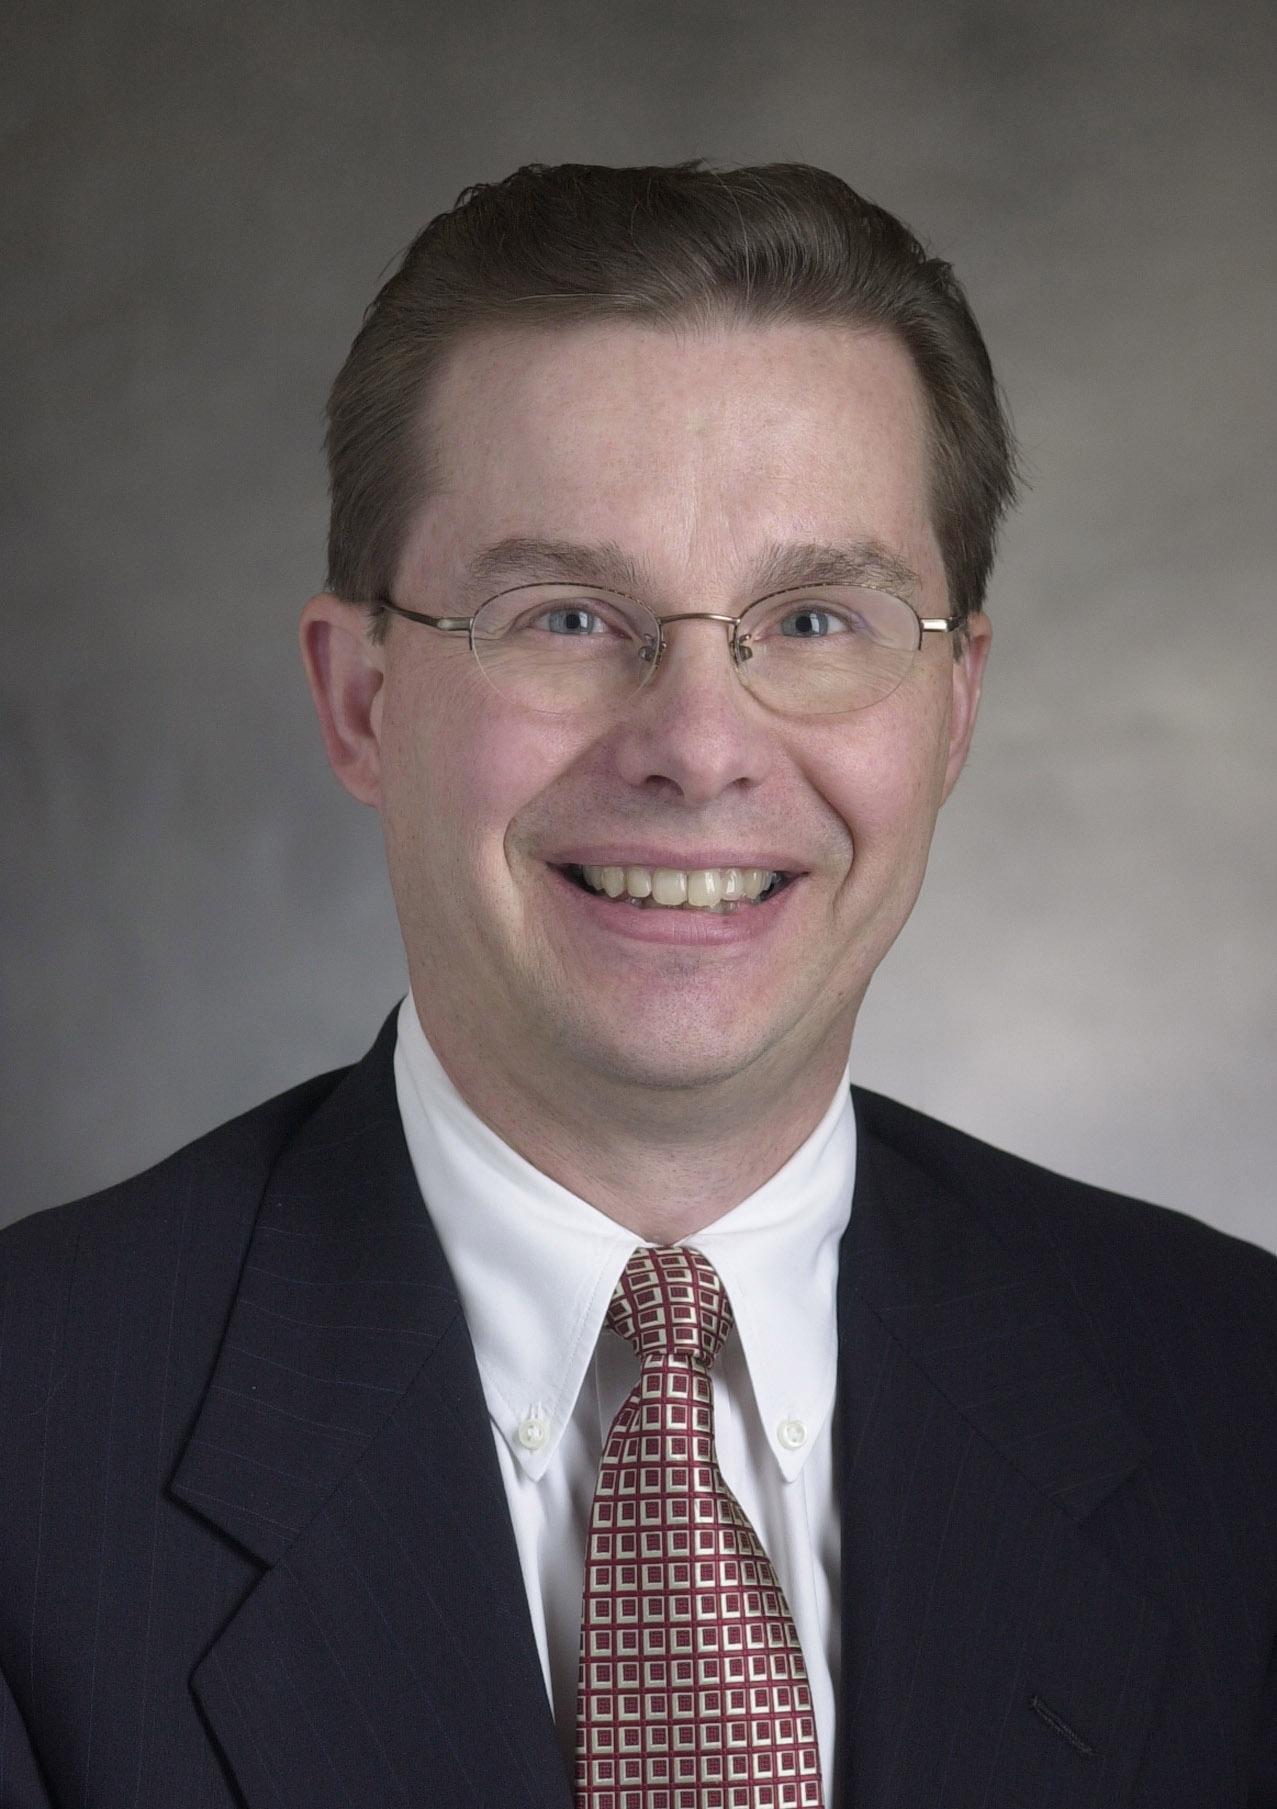 JEFFREY WRIGHT MAXWELL Financial Professional & Insurance Agent